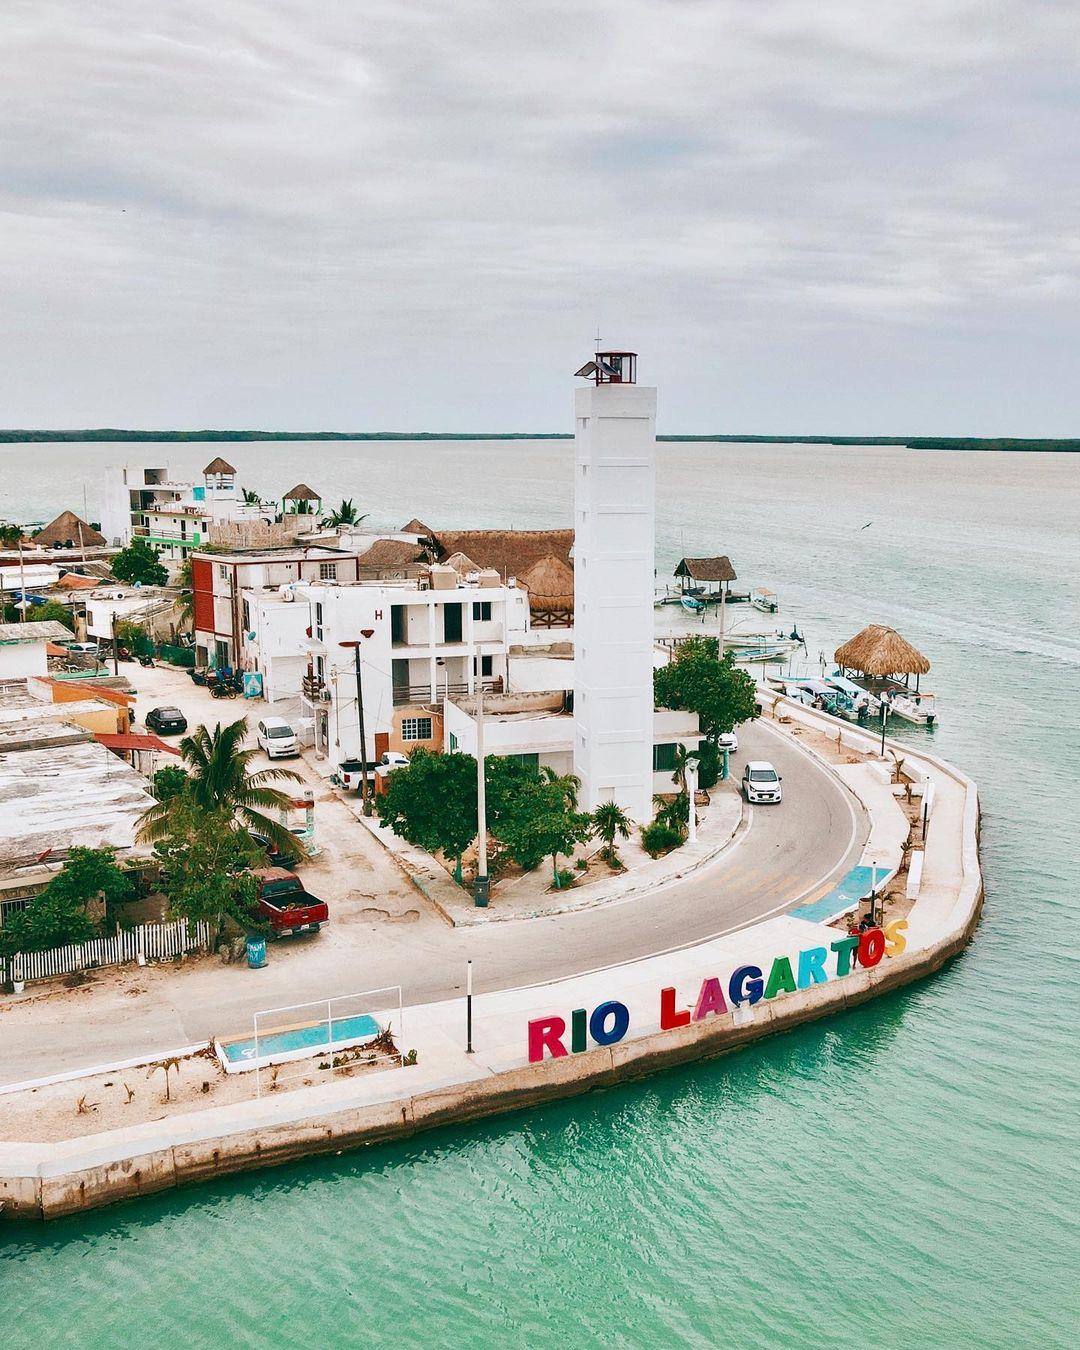 Río Lagartos, Yucatán